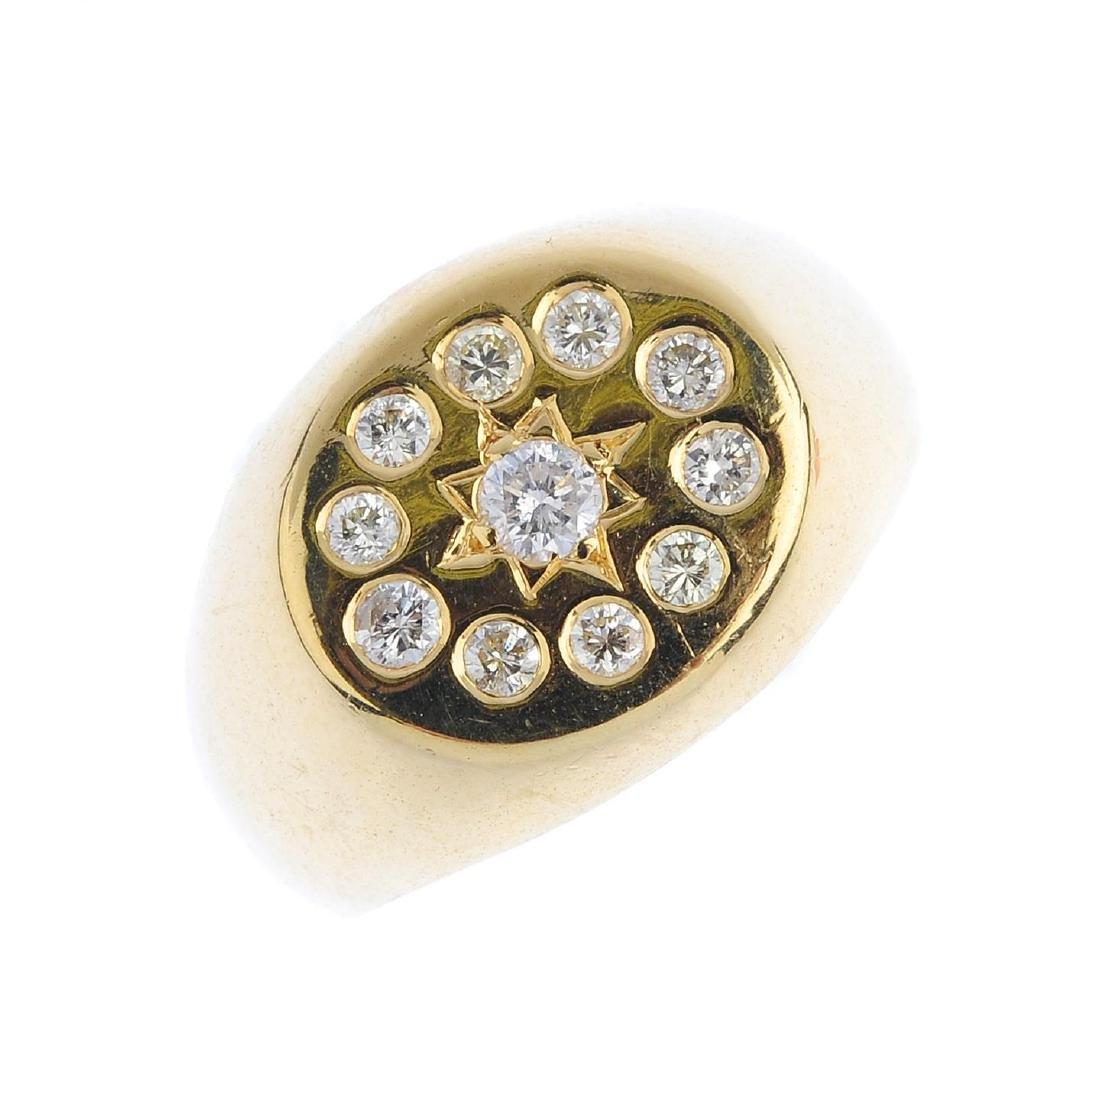 A gentleman's diamond signet ring. The brilliant-cut